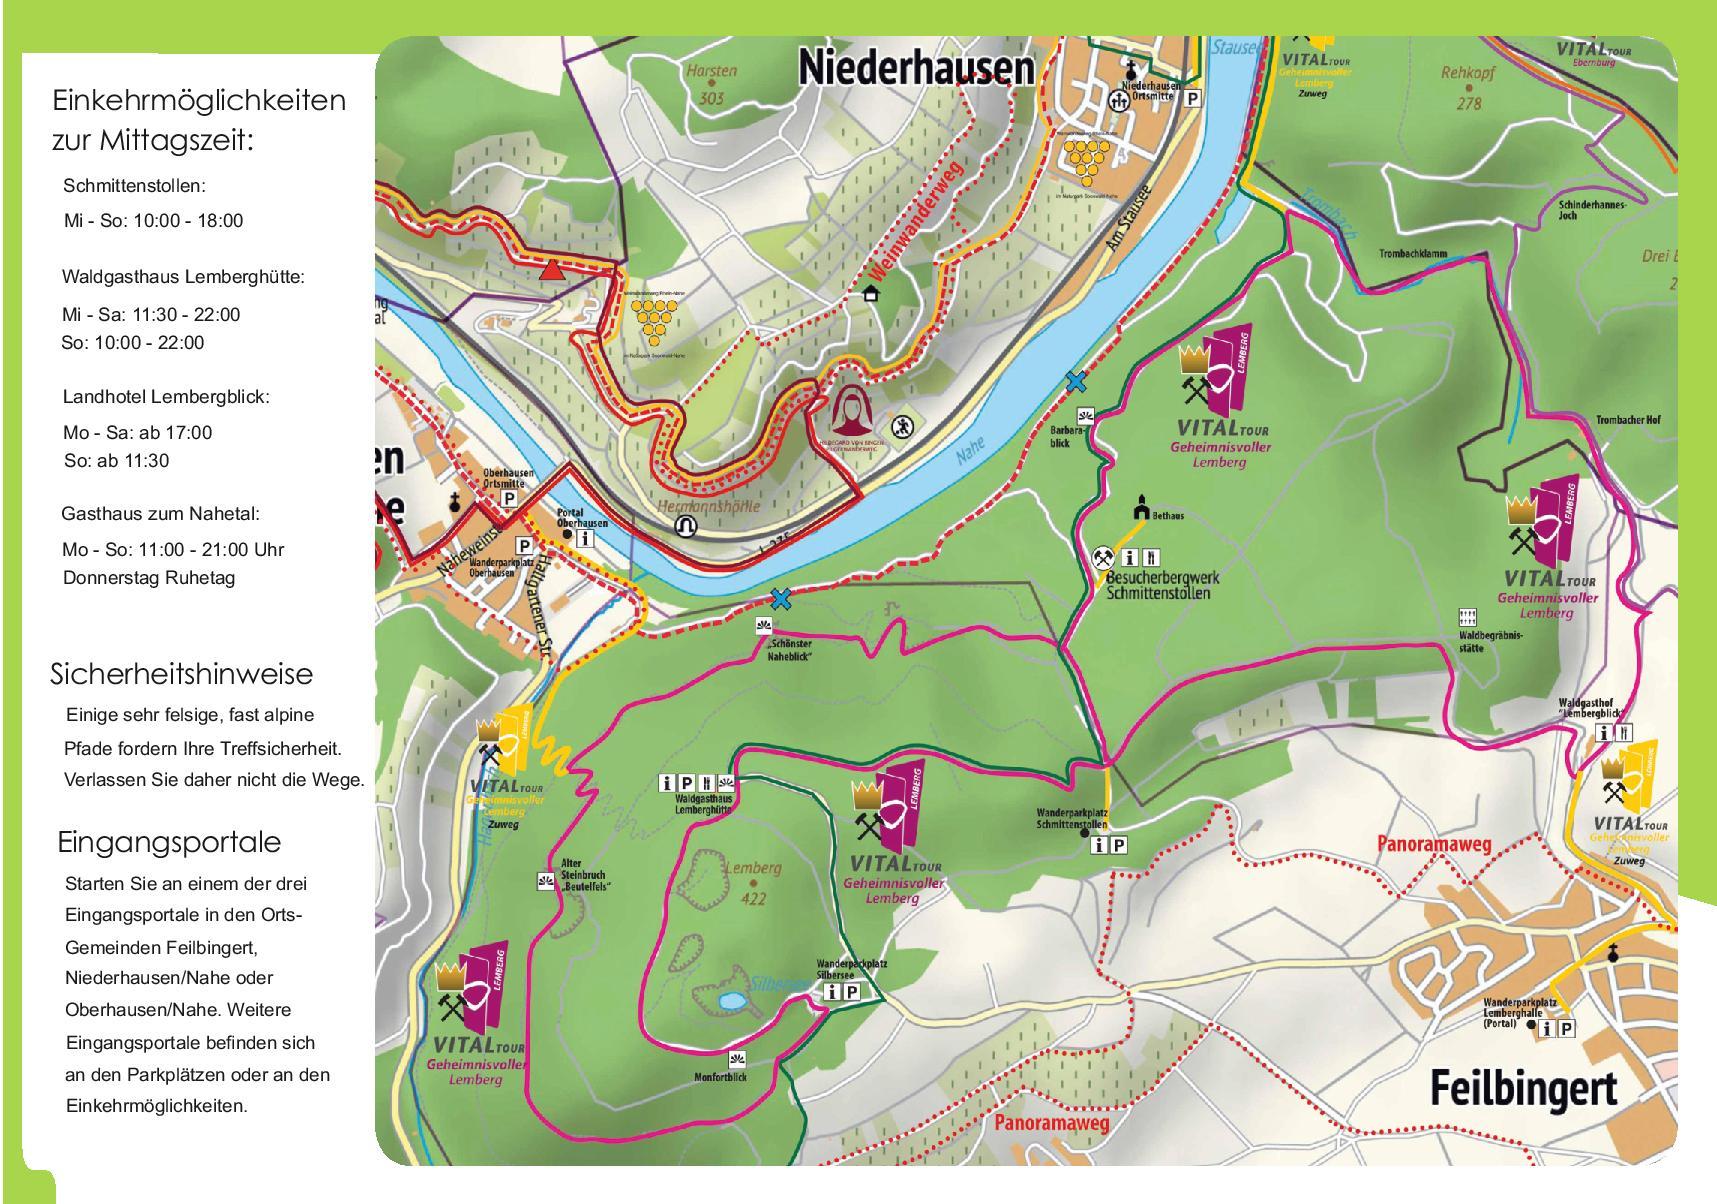 Karte VitalTour Geheimnisvoller Lemberg